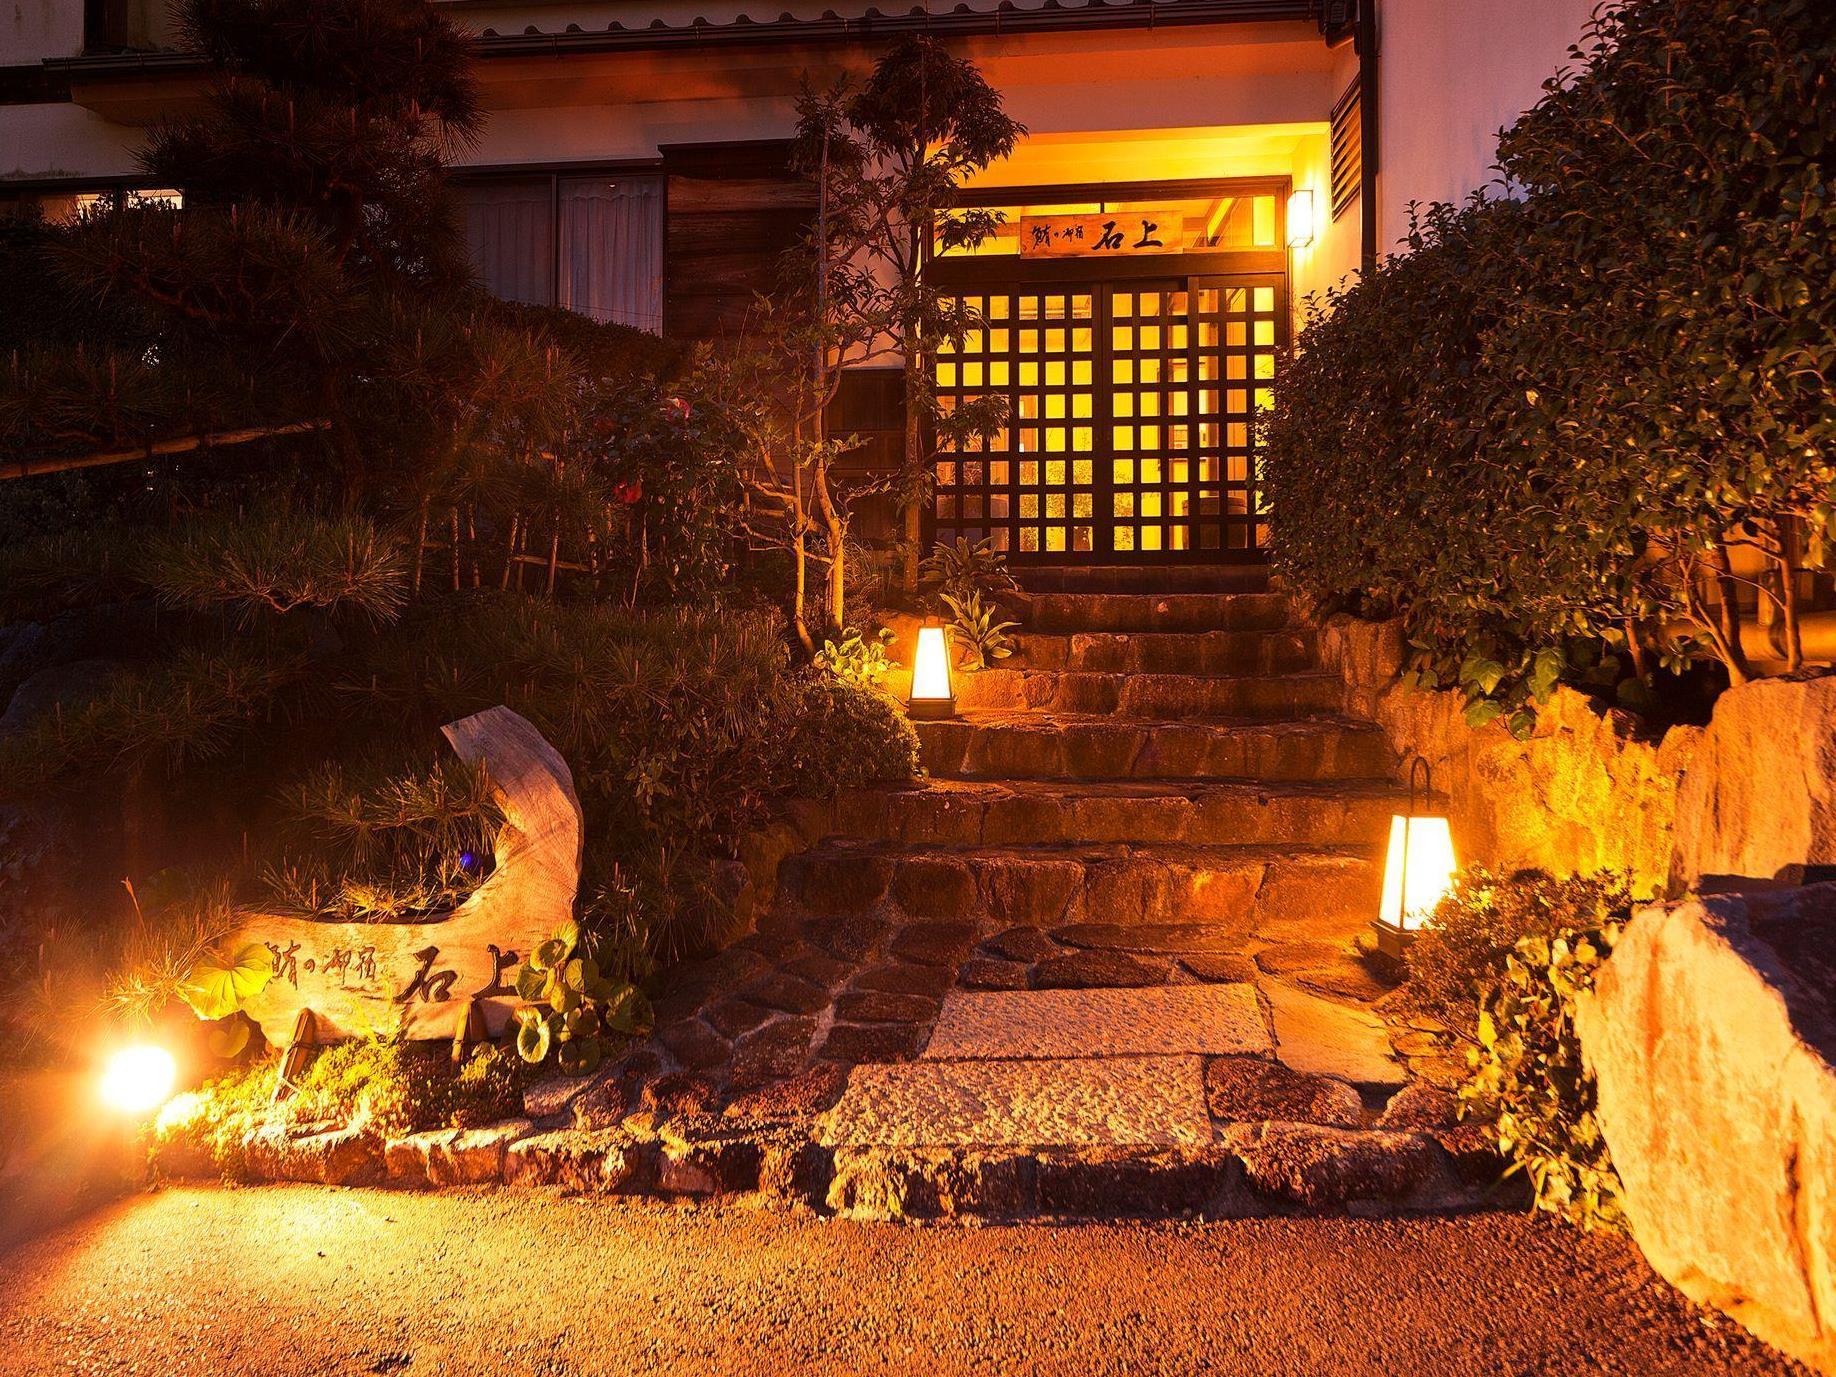 Maguro no Oyado Ishigami Hot Spring Ryokan, Yaizu